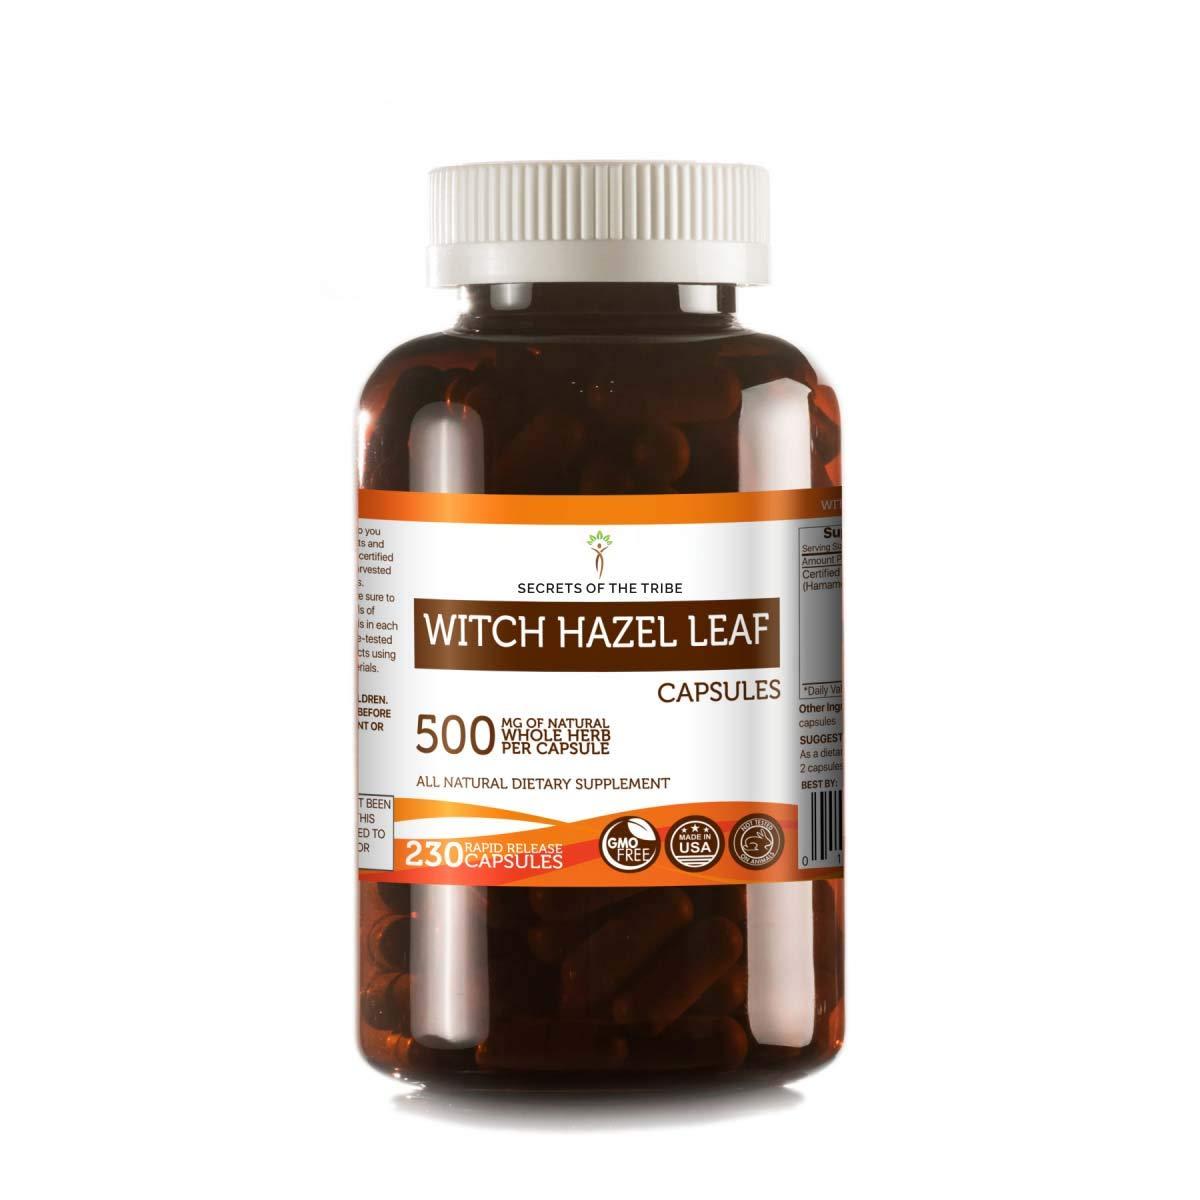 Witch Hazel Leaf 230 Capsules, 500 mg, Organic Witch Hazel Leaf (Hamamelis virginiana) Dried Leaf (230 Capsules)